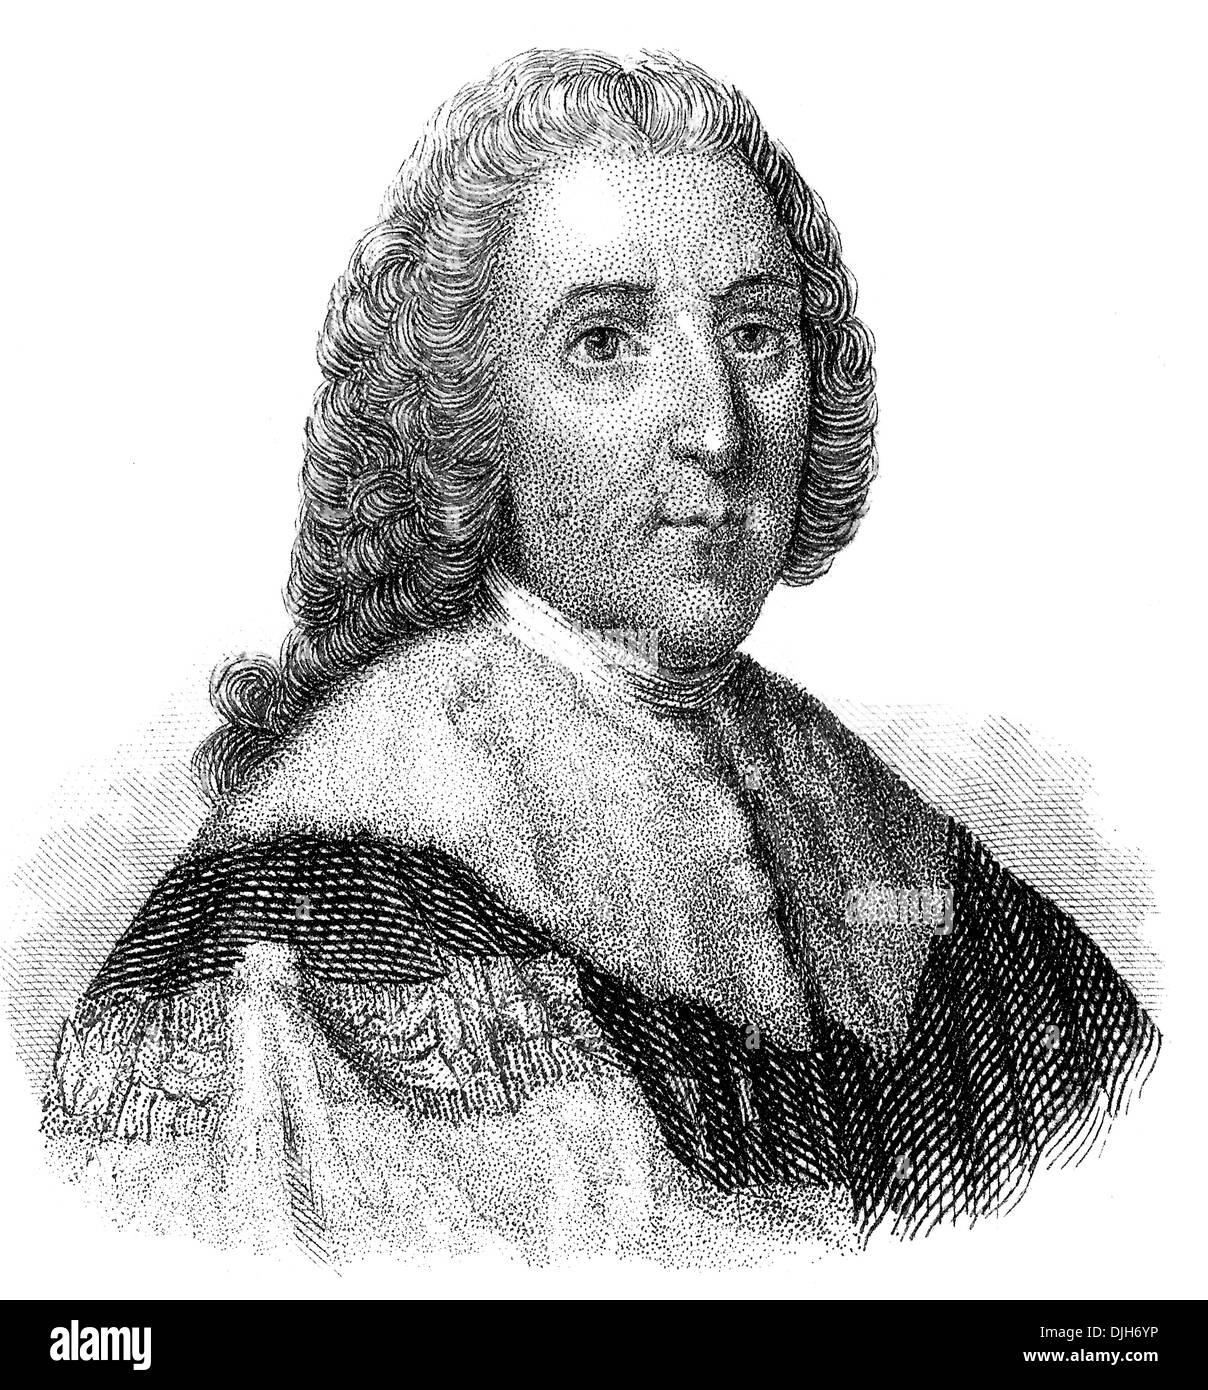 Portrait of William Pitt, 1st Earl of Chatham, William Pitt the Elder, 1708 - 1778, a British Whig statesman - Stock Image